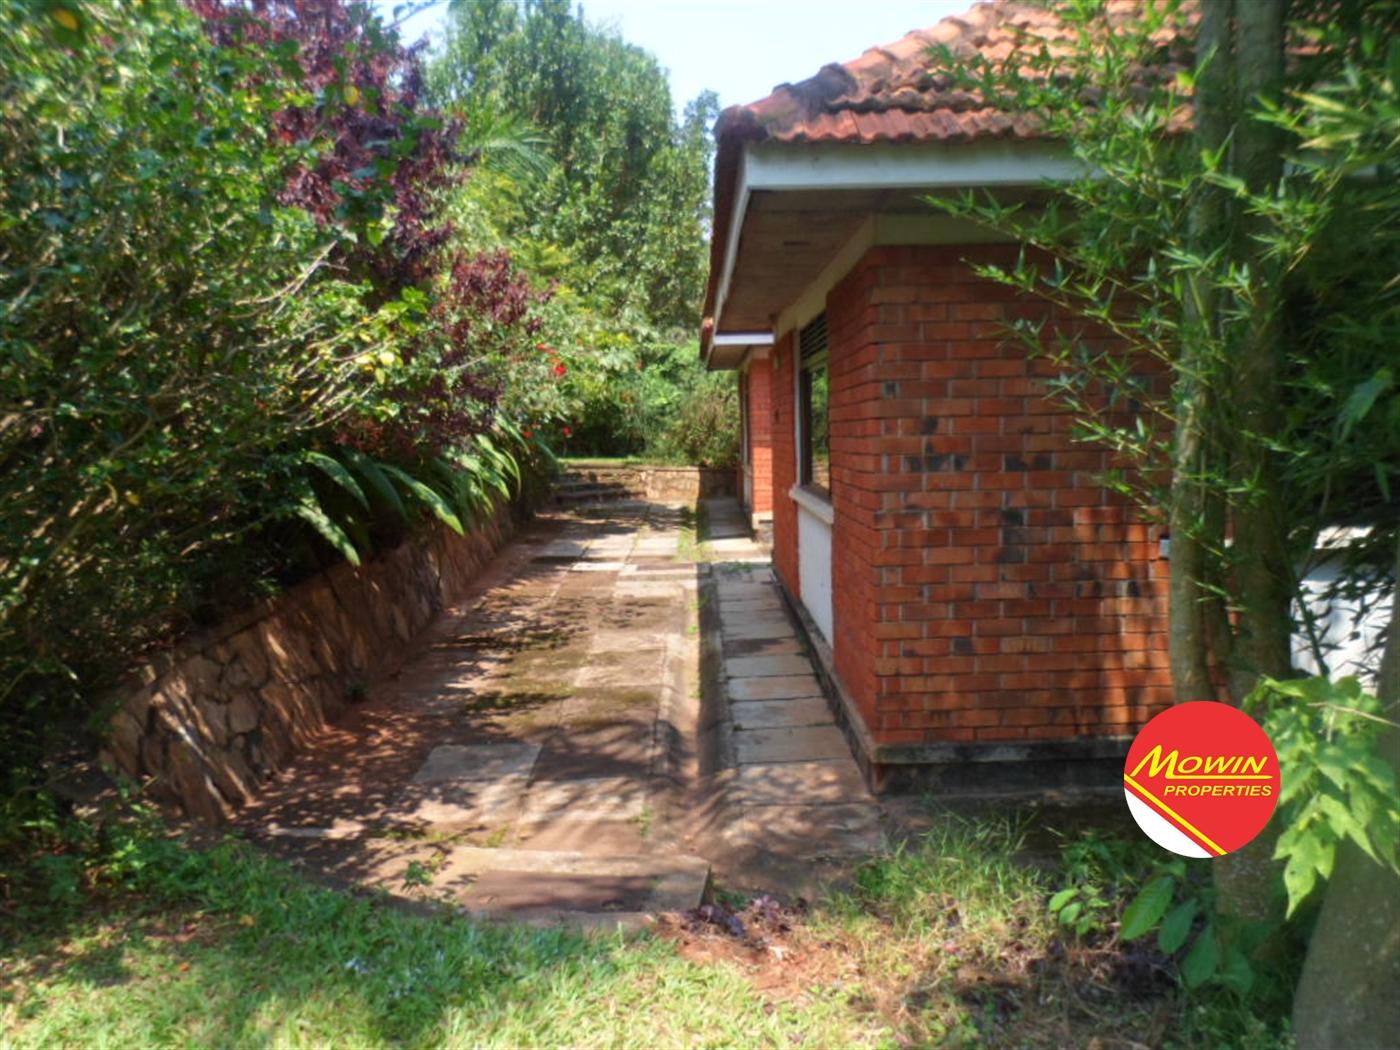 Bungalow for rent in Bugolobi Kampala